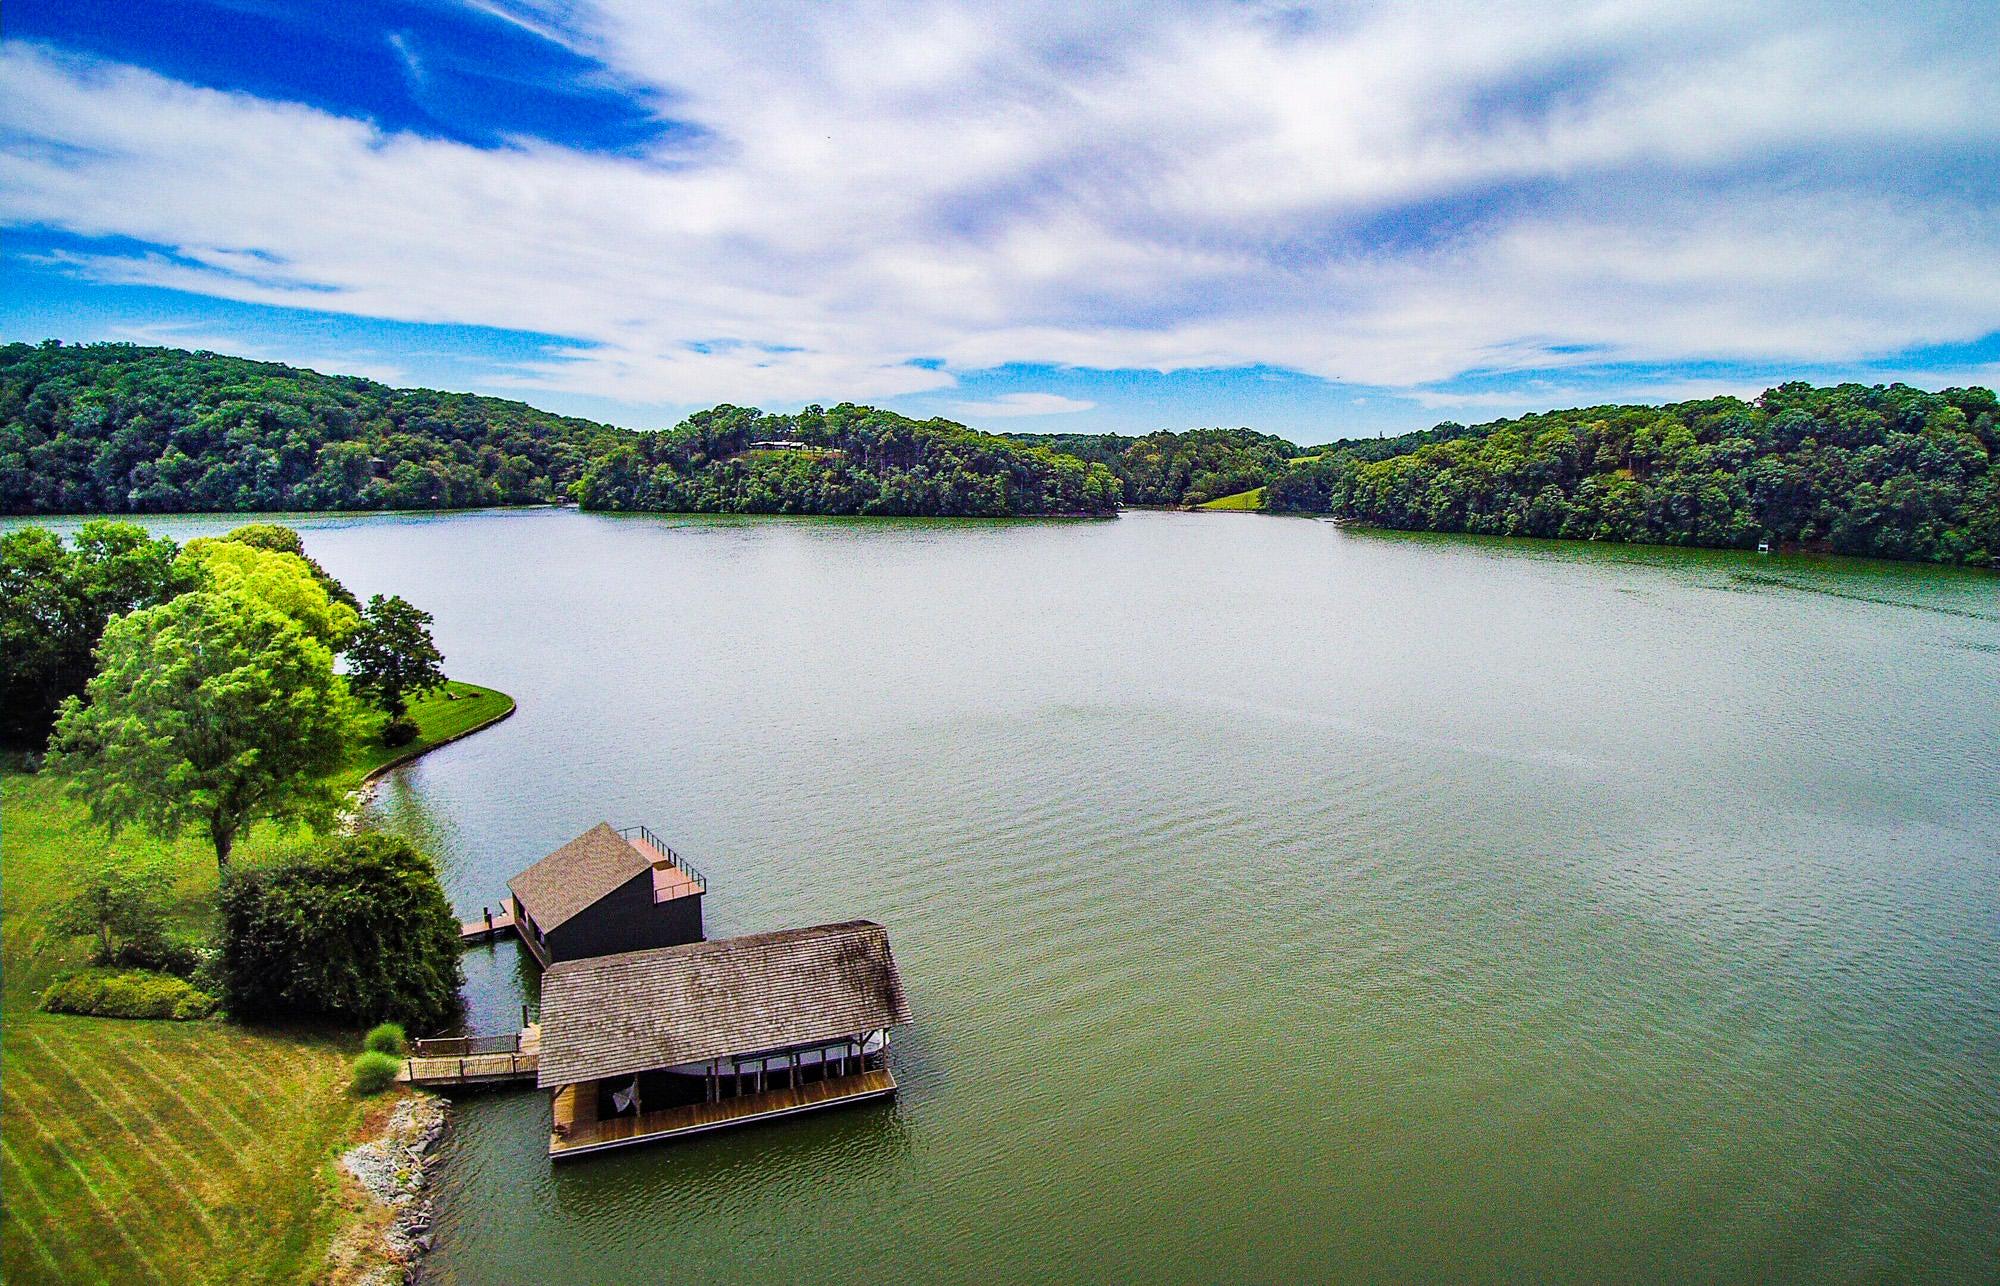 Full lake view